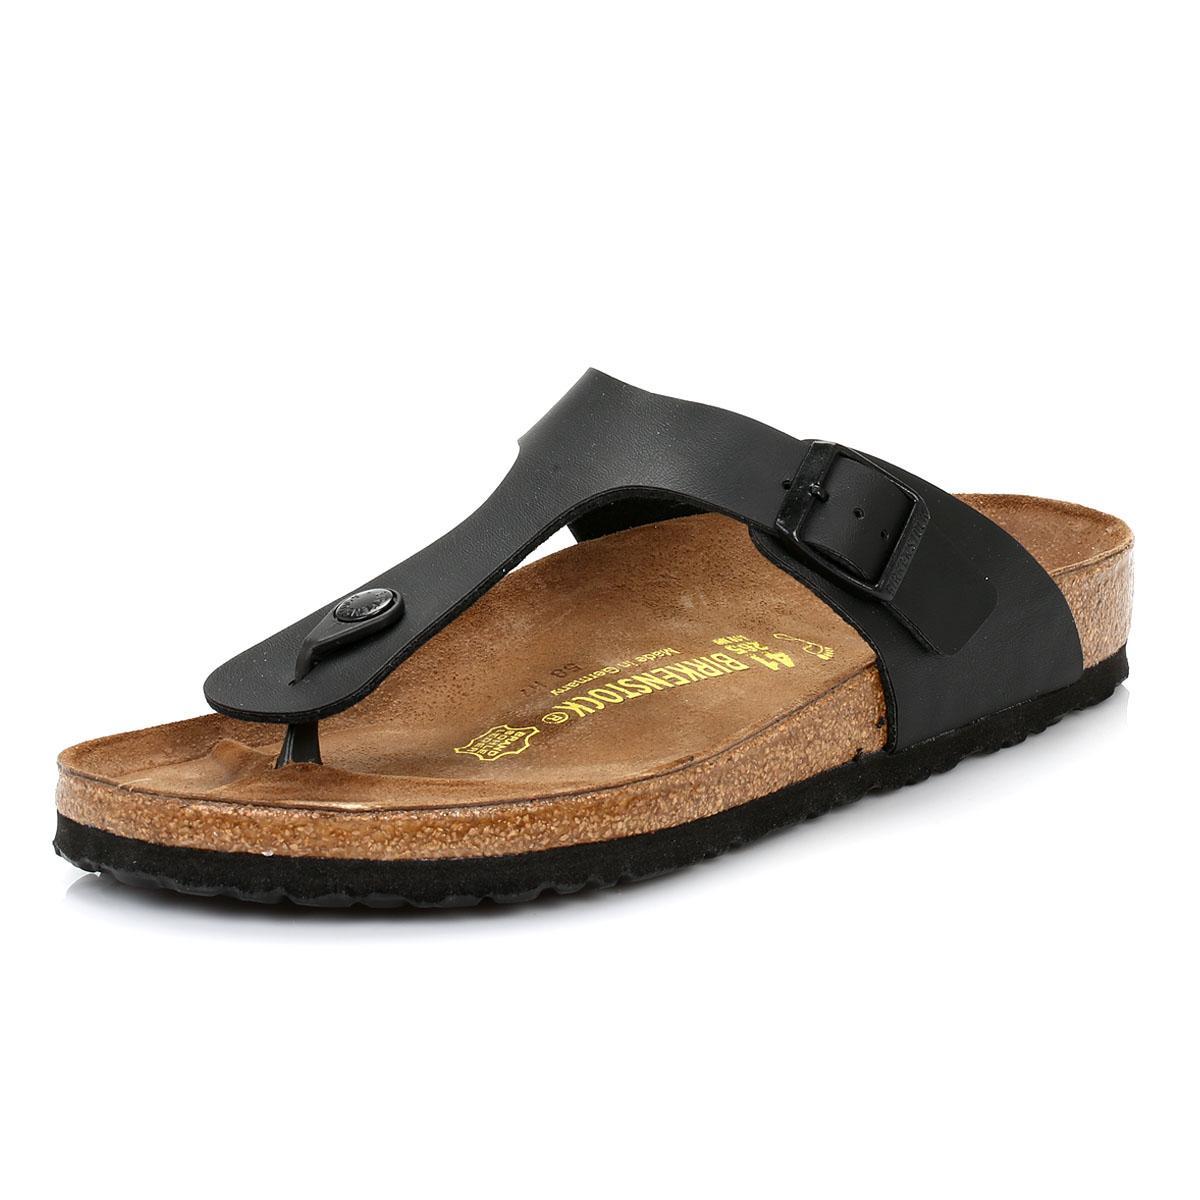 ed7d3c57598 Birkenstock - Gizeh Birko-flor Womens Black Sandals - Lyst. View fullscreen